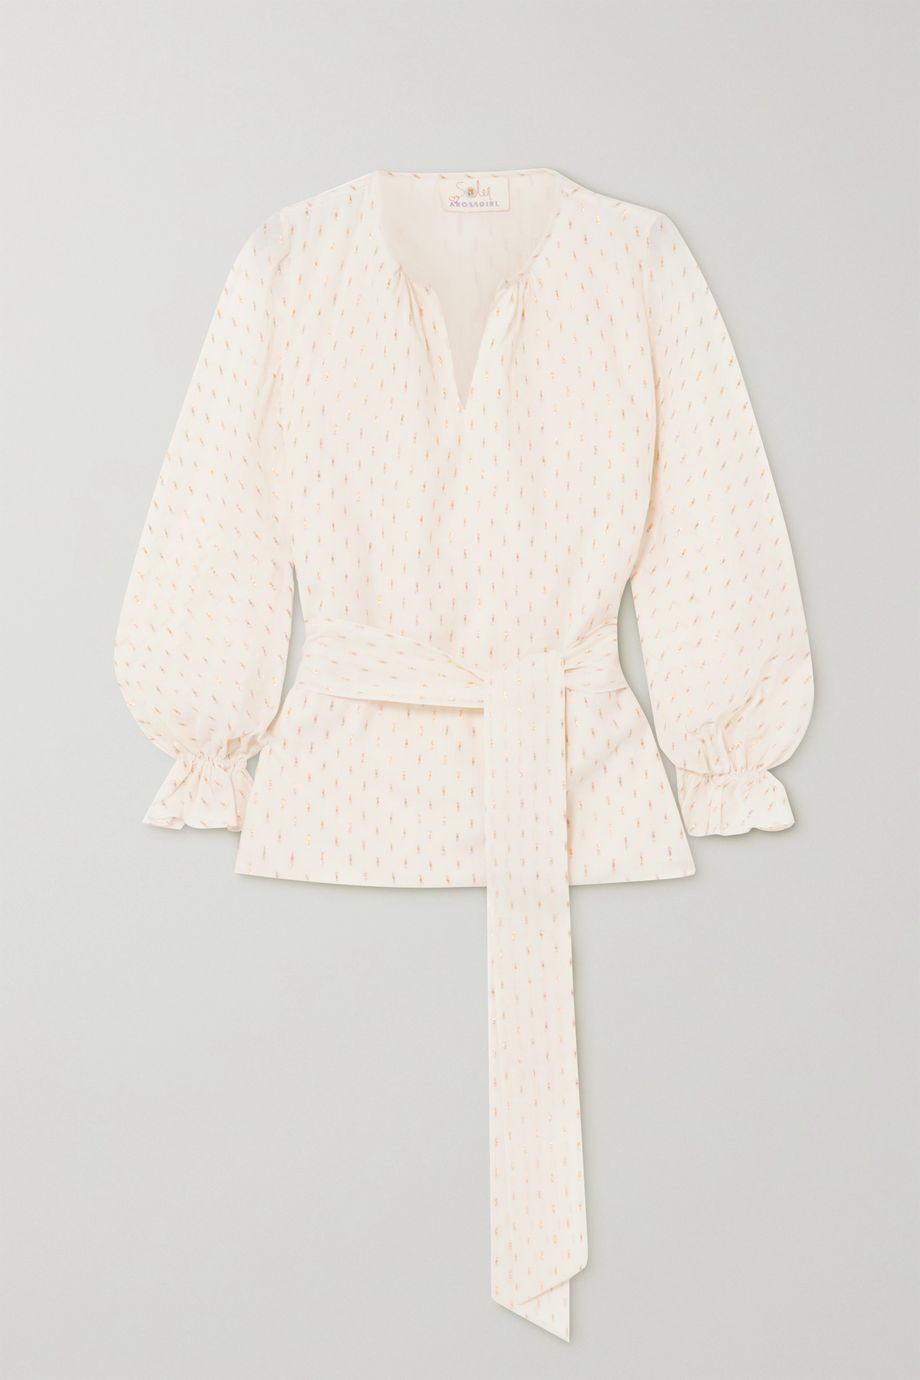 ARoss Girl x Soler Amanda belted metallic fil coupé cotton-blend blouse